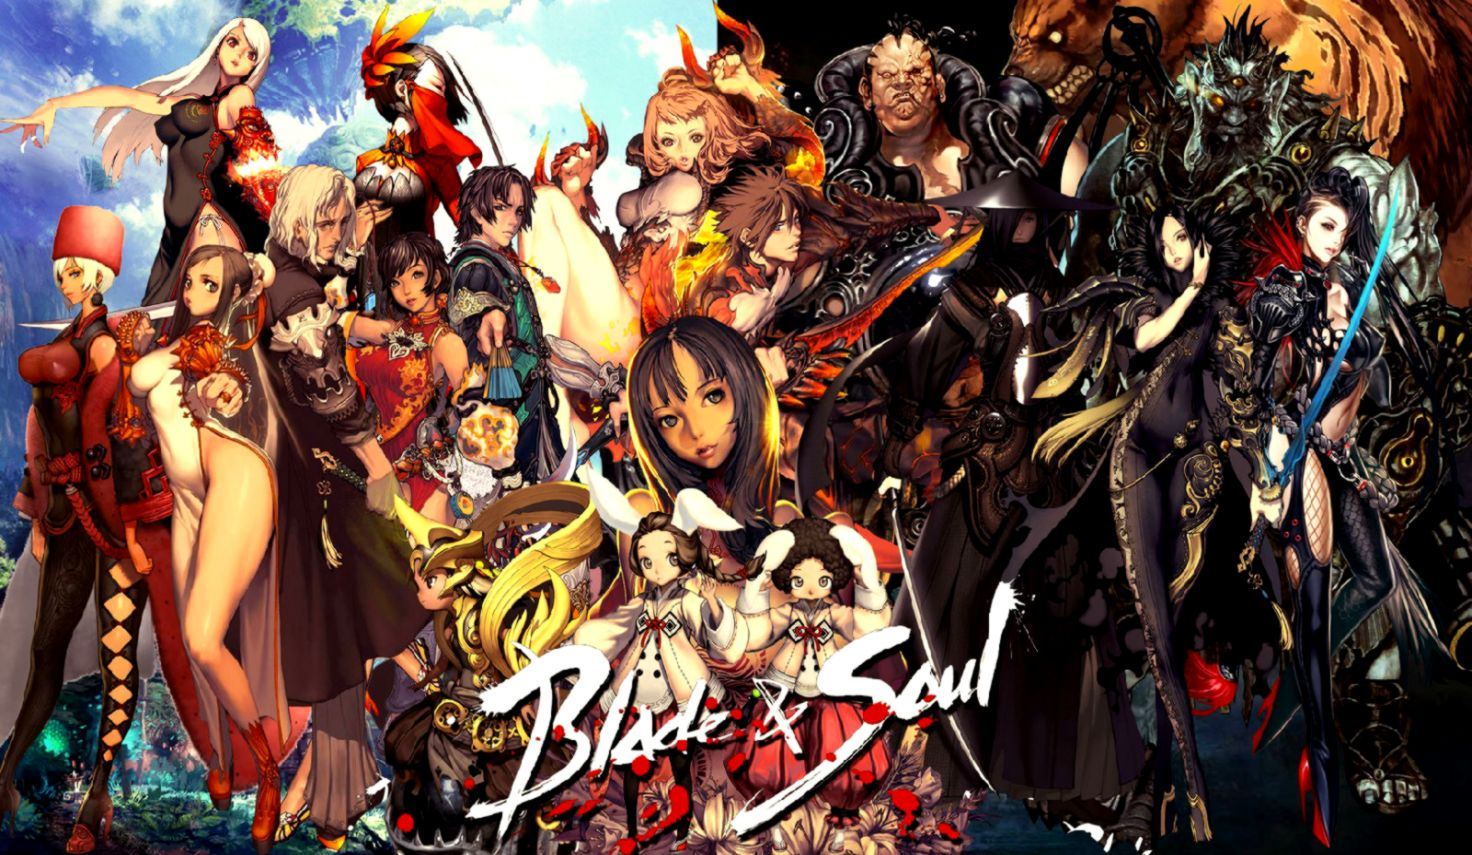 Blade Soul Wallpaper Hd Posted By Ethan Peltier